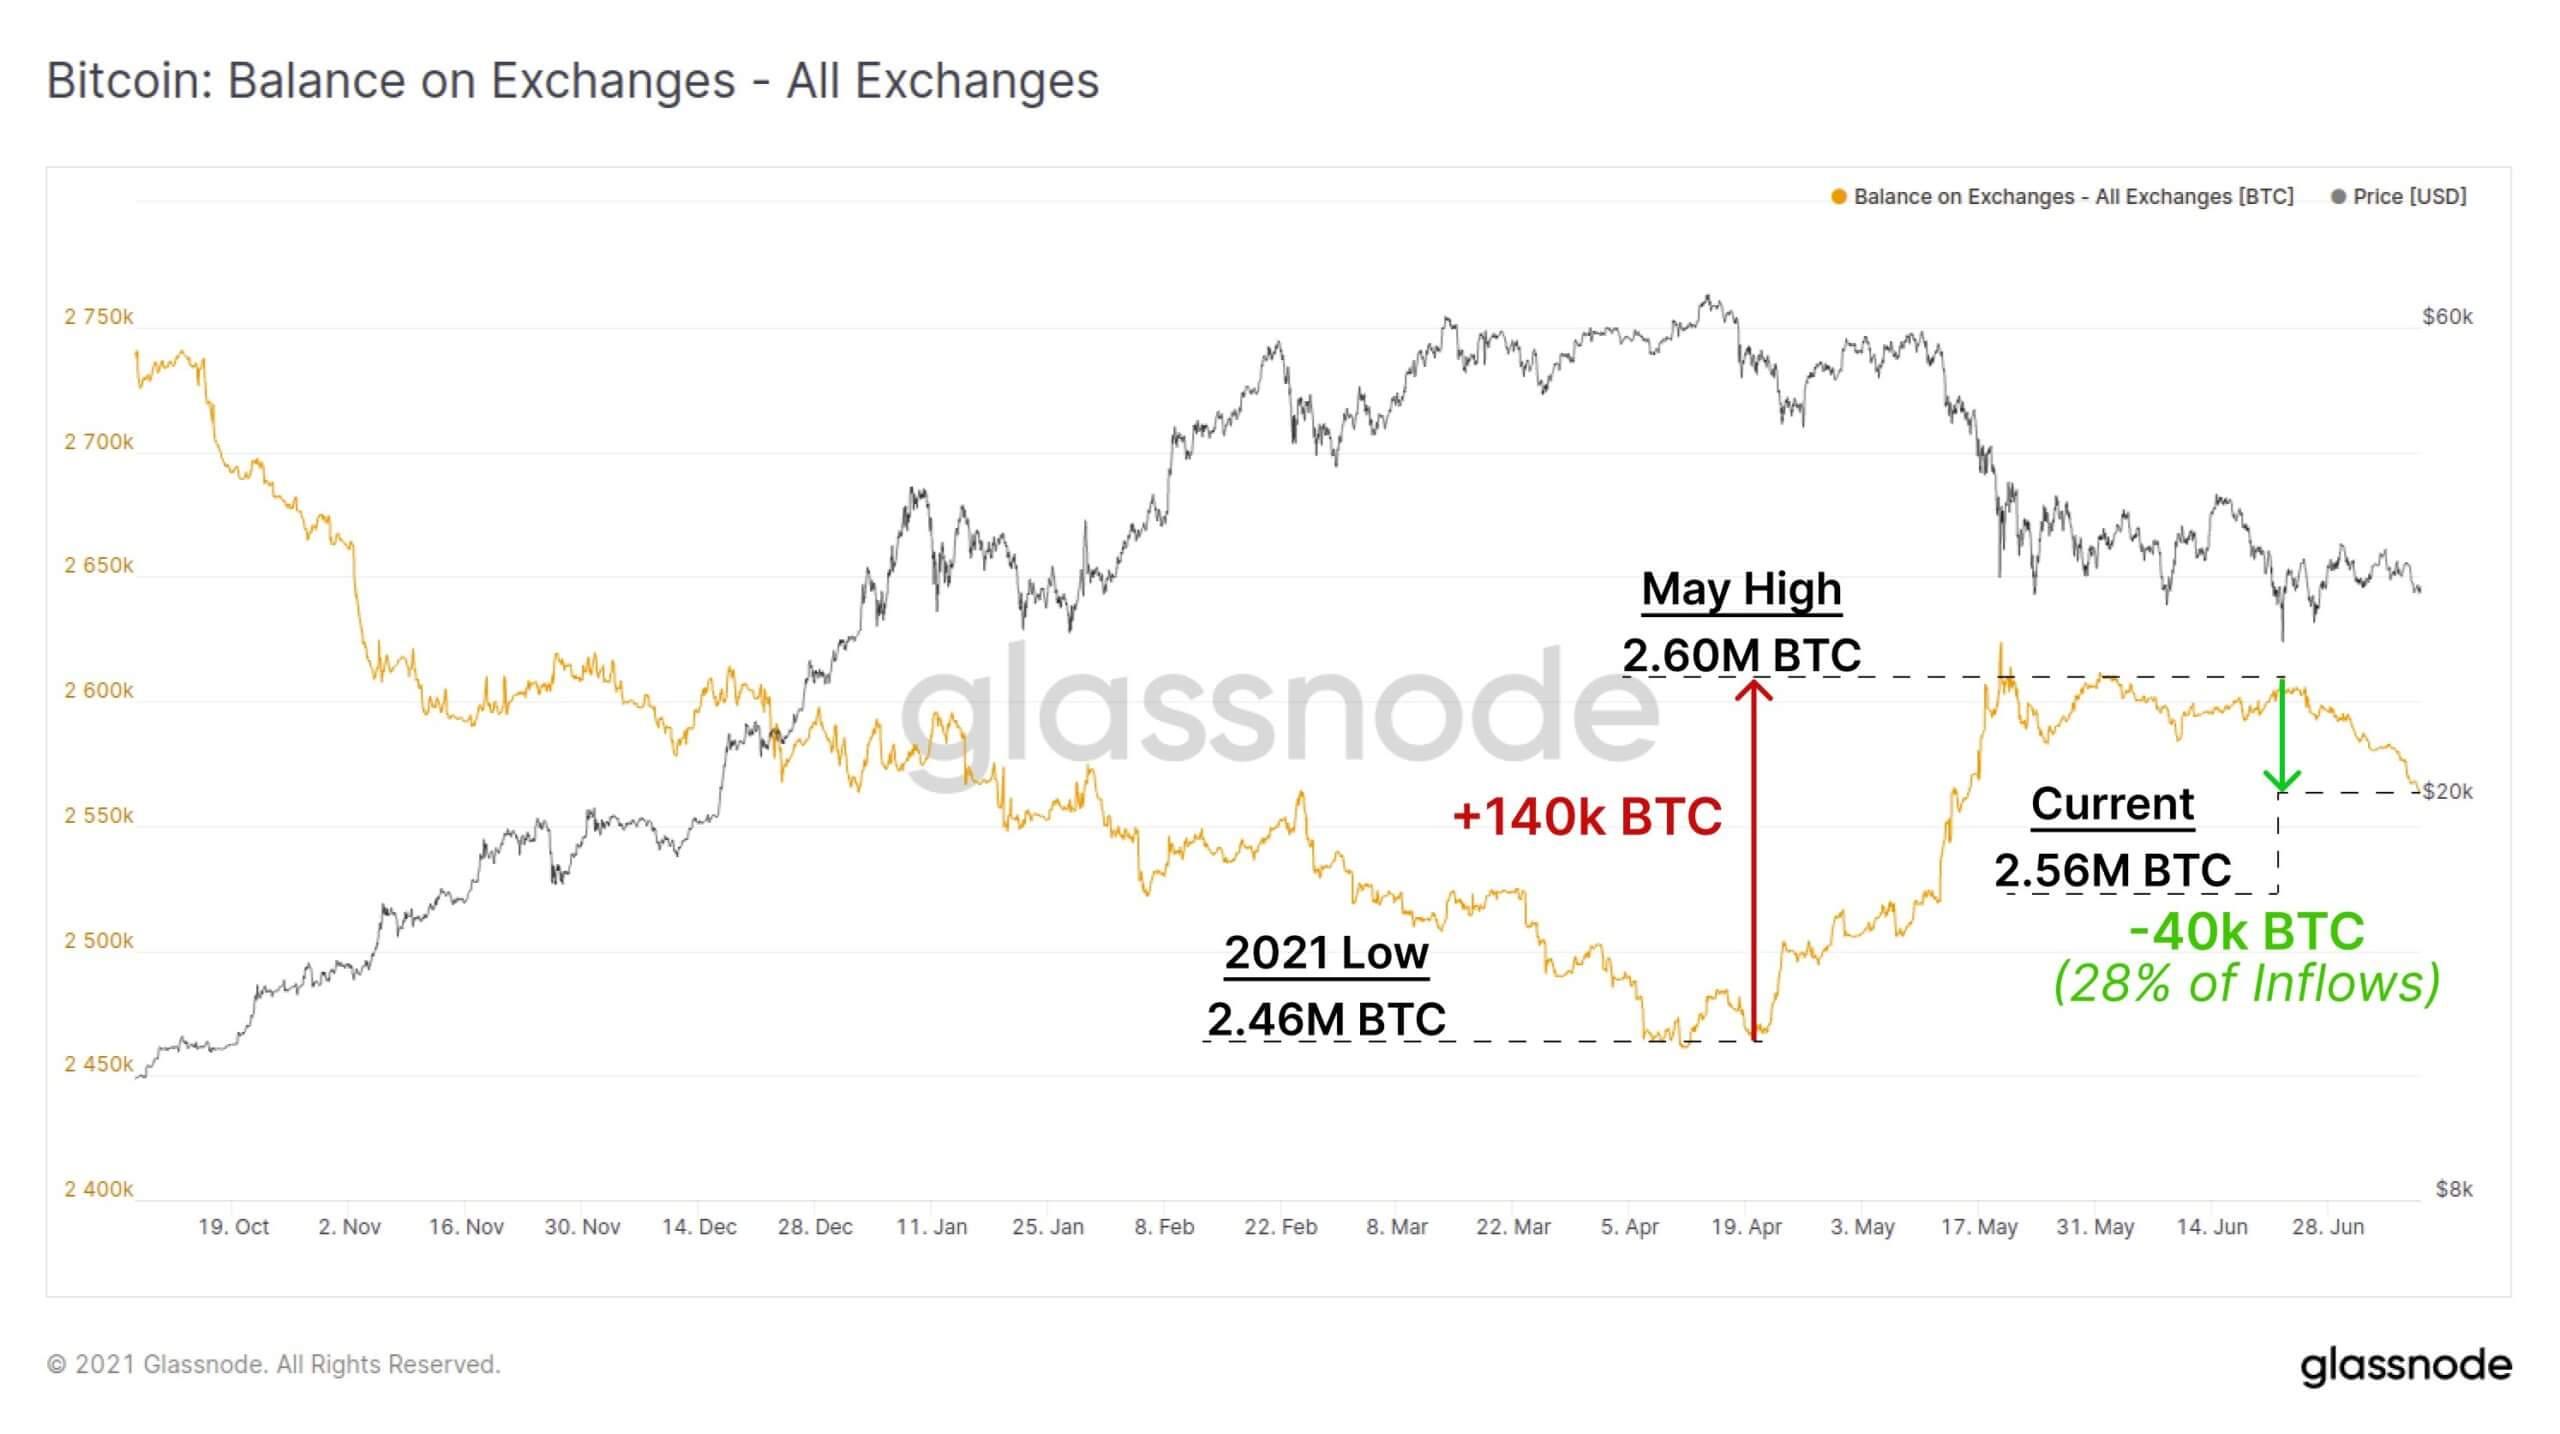 Bitcoin exchange flows